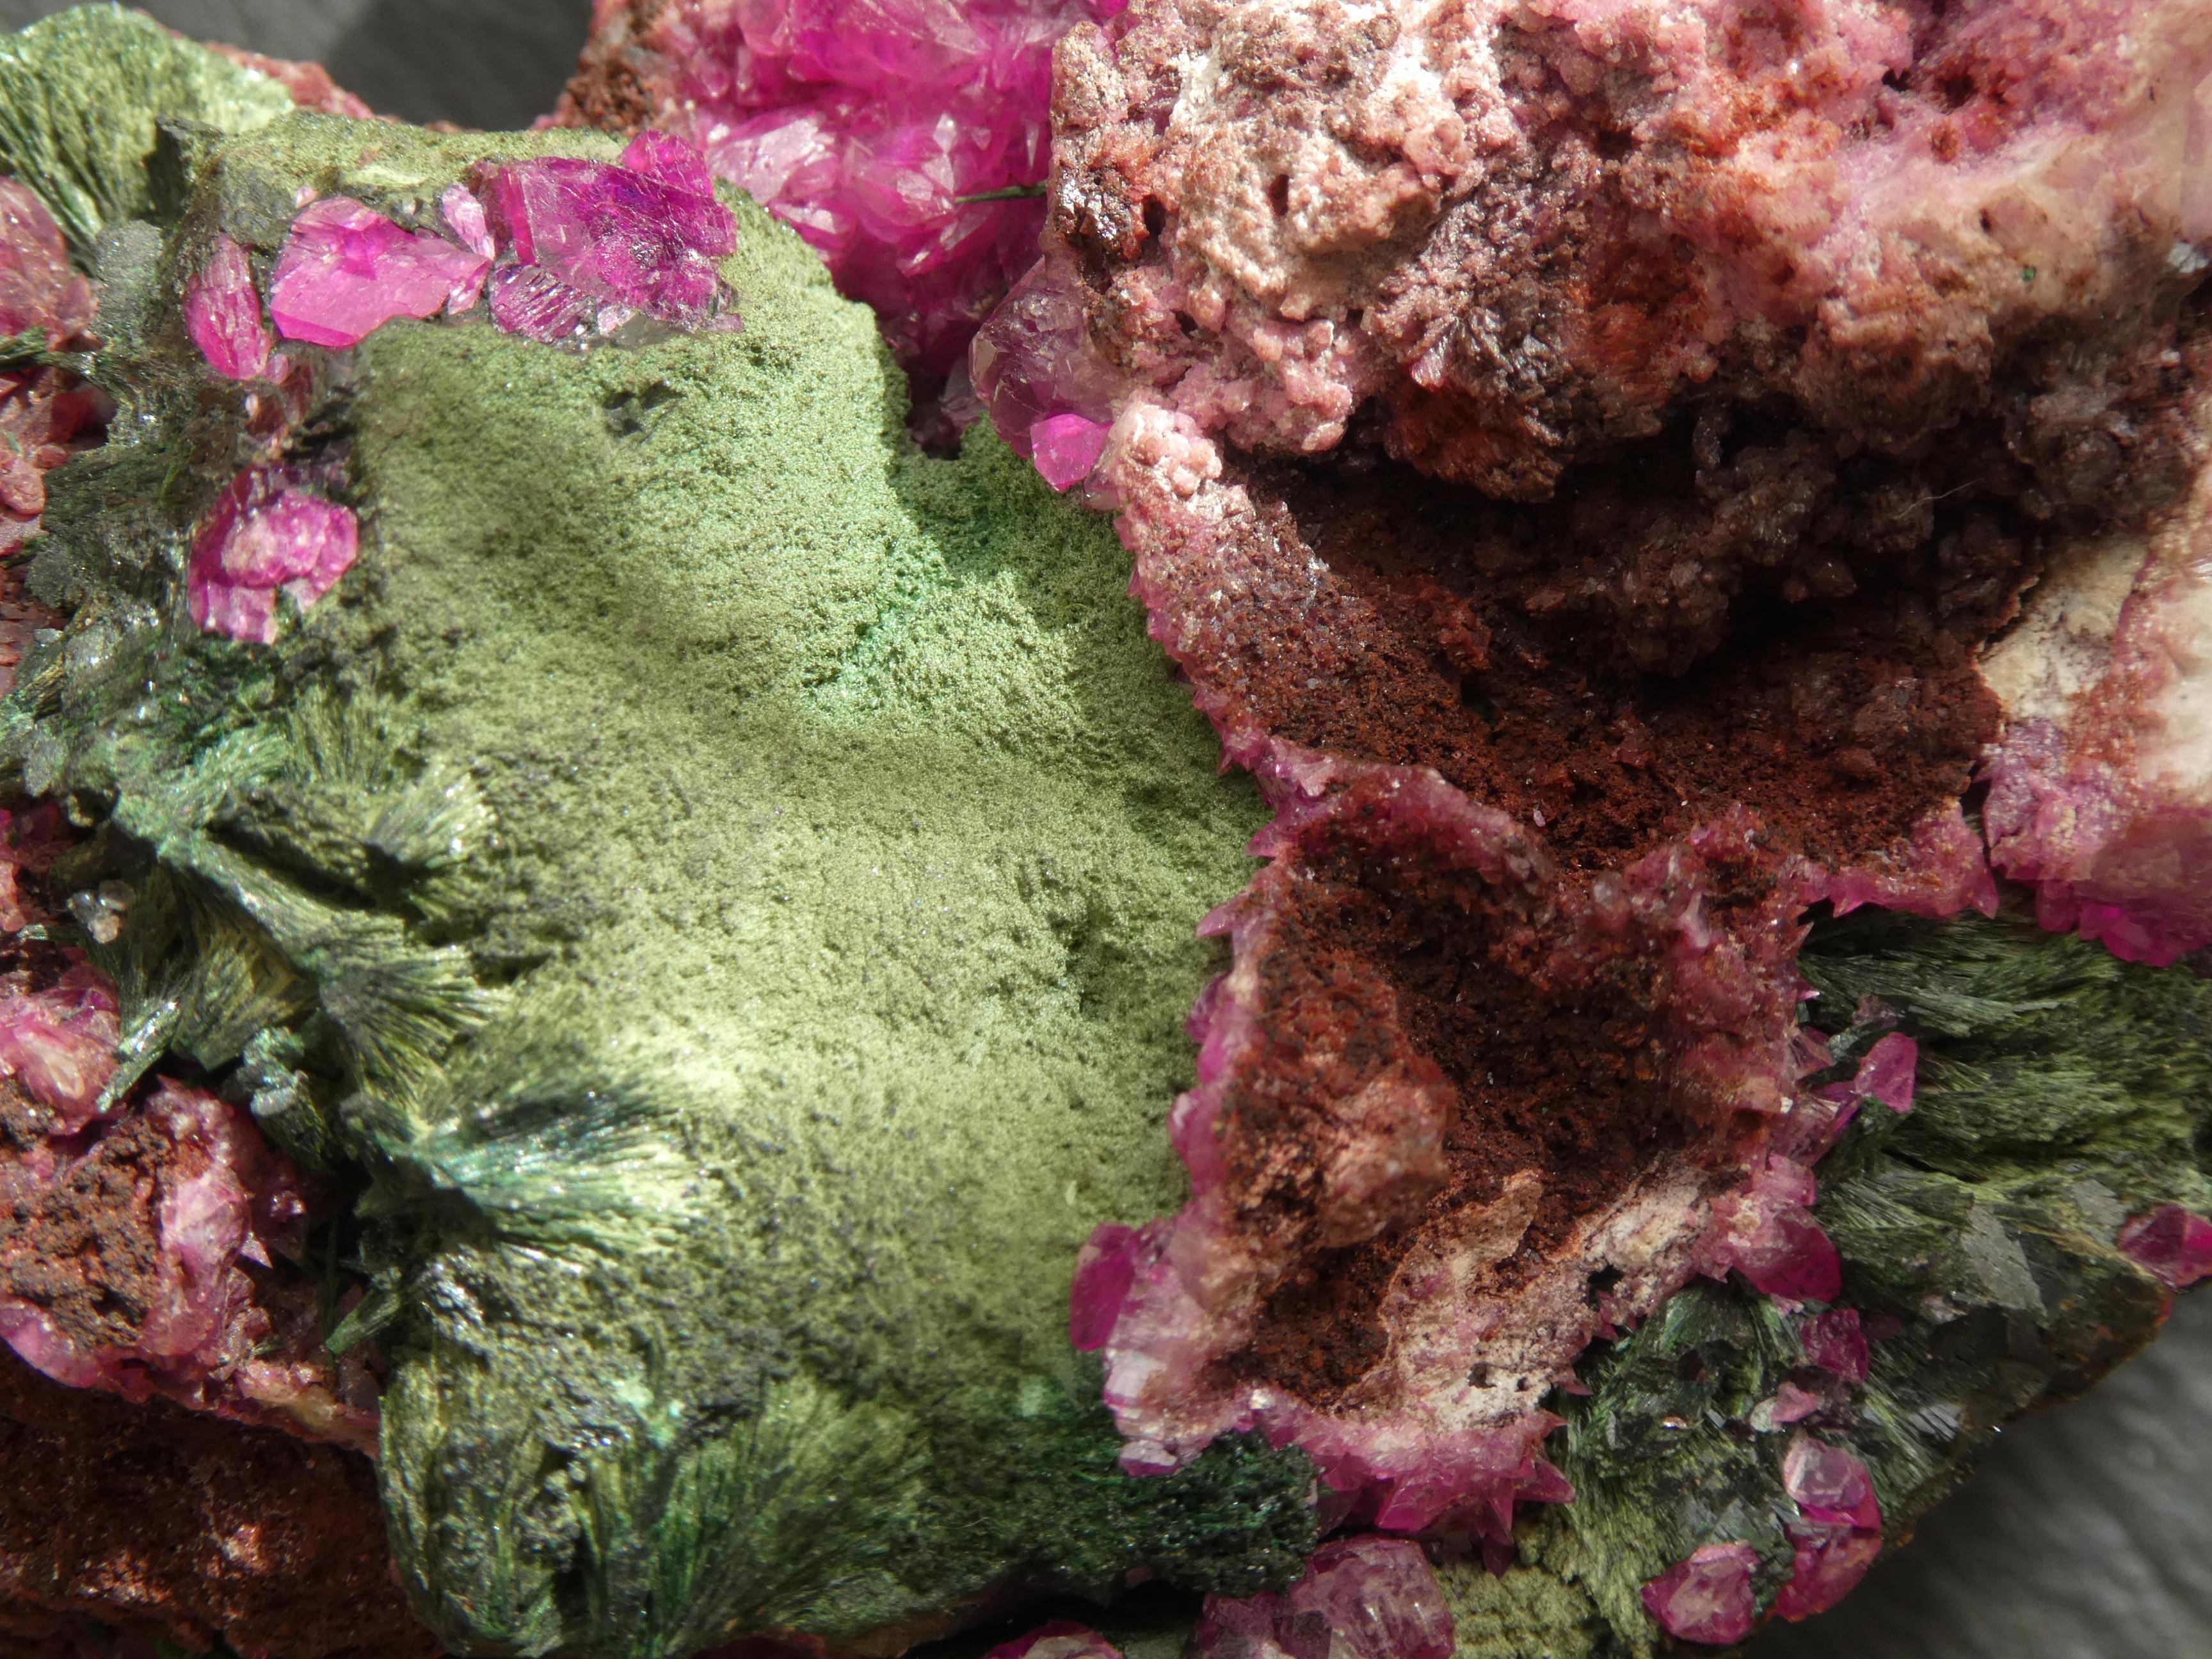 Minéral Kolwésite fibro-radiée (verte) sur Calcite-cobaltifère (rose), Philippe Thiran